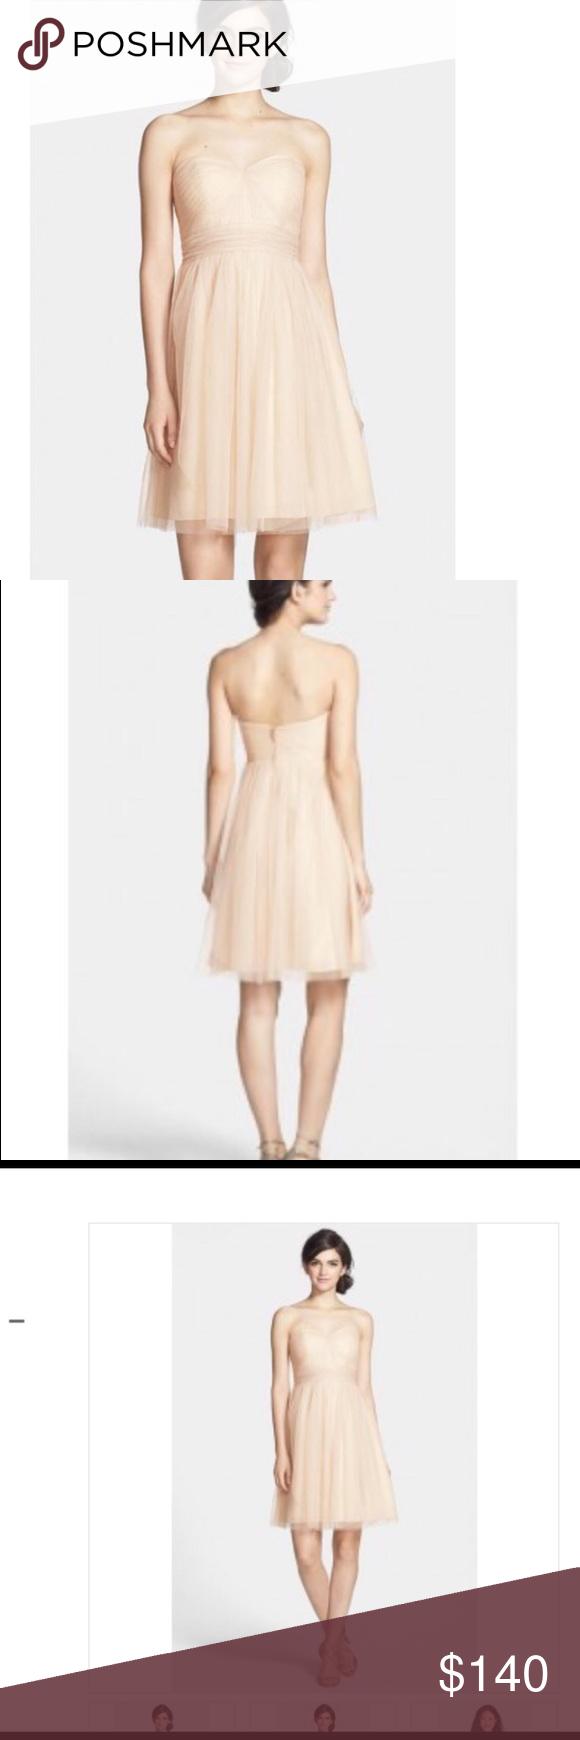 JENNY YOO WREN CONVERTIBLE TULLE FIT & FLARE DRESS Breathtaking dress, never been worn. Jenny Yoo Dresses Strapless